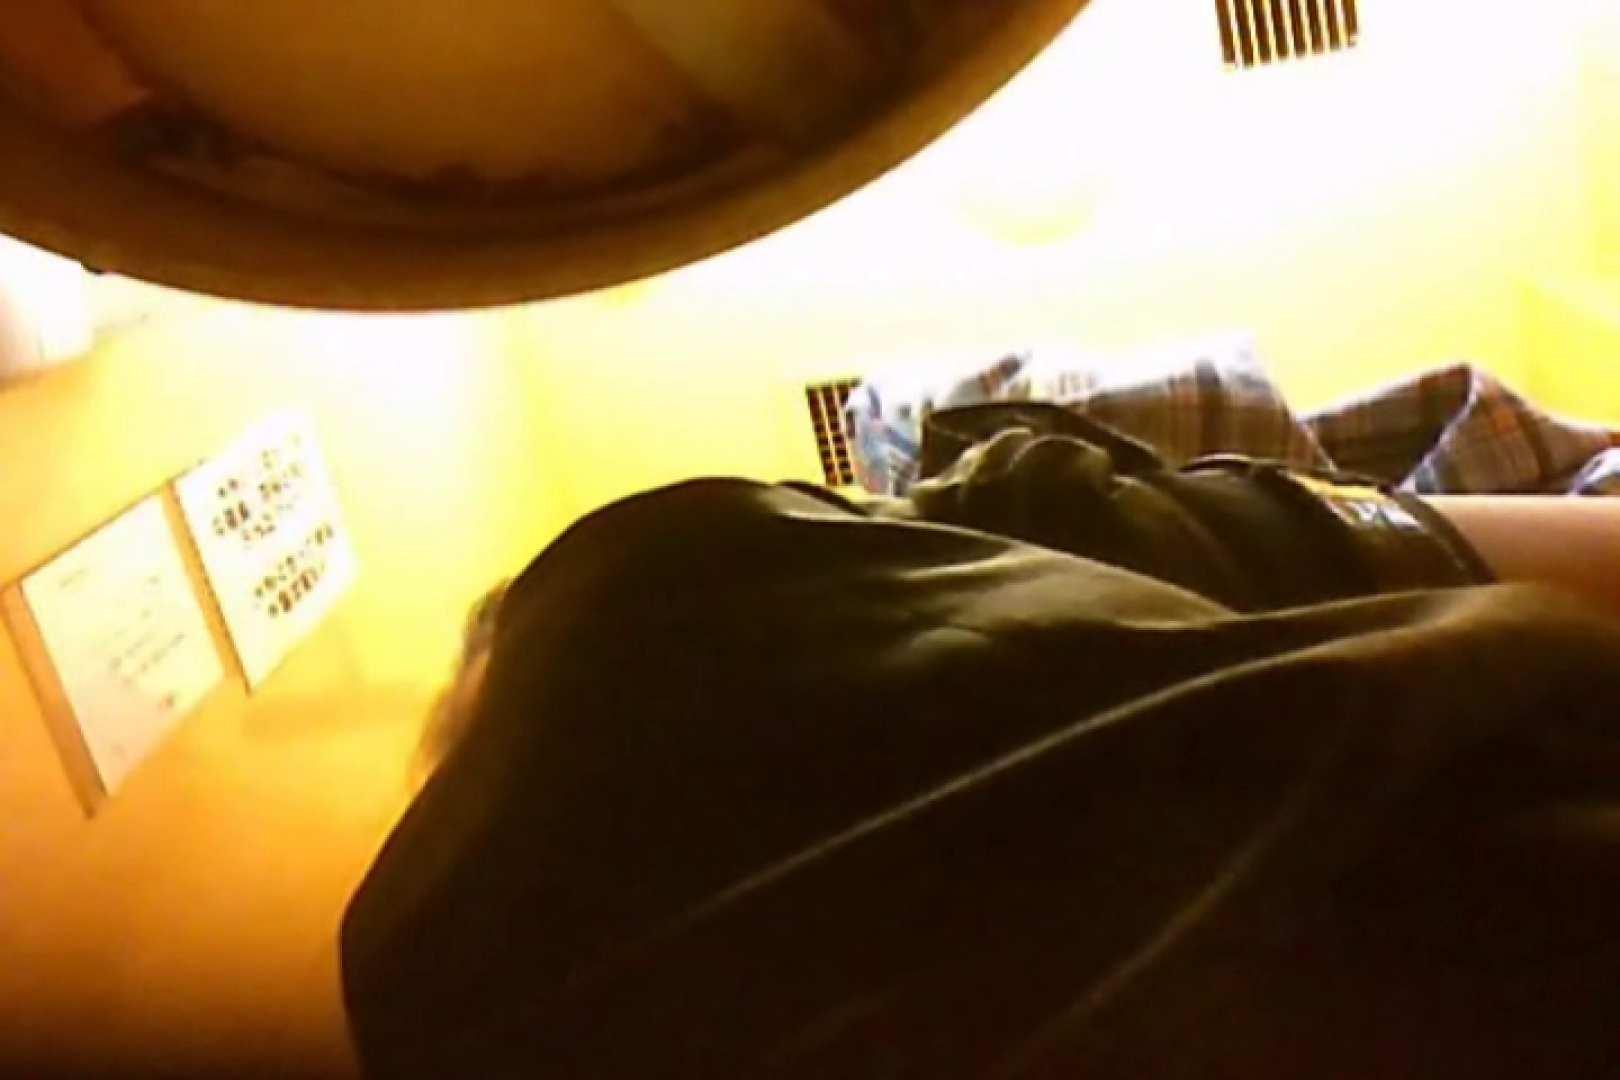 SEASON 3rd!掴み取りさんの洗面所覗き!in新幹線!VOL.09 覗きお宝 ゲイアダルトビデオ画像 71連発 68